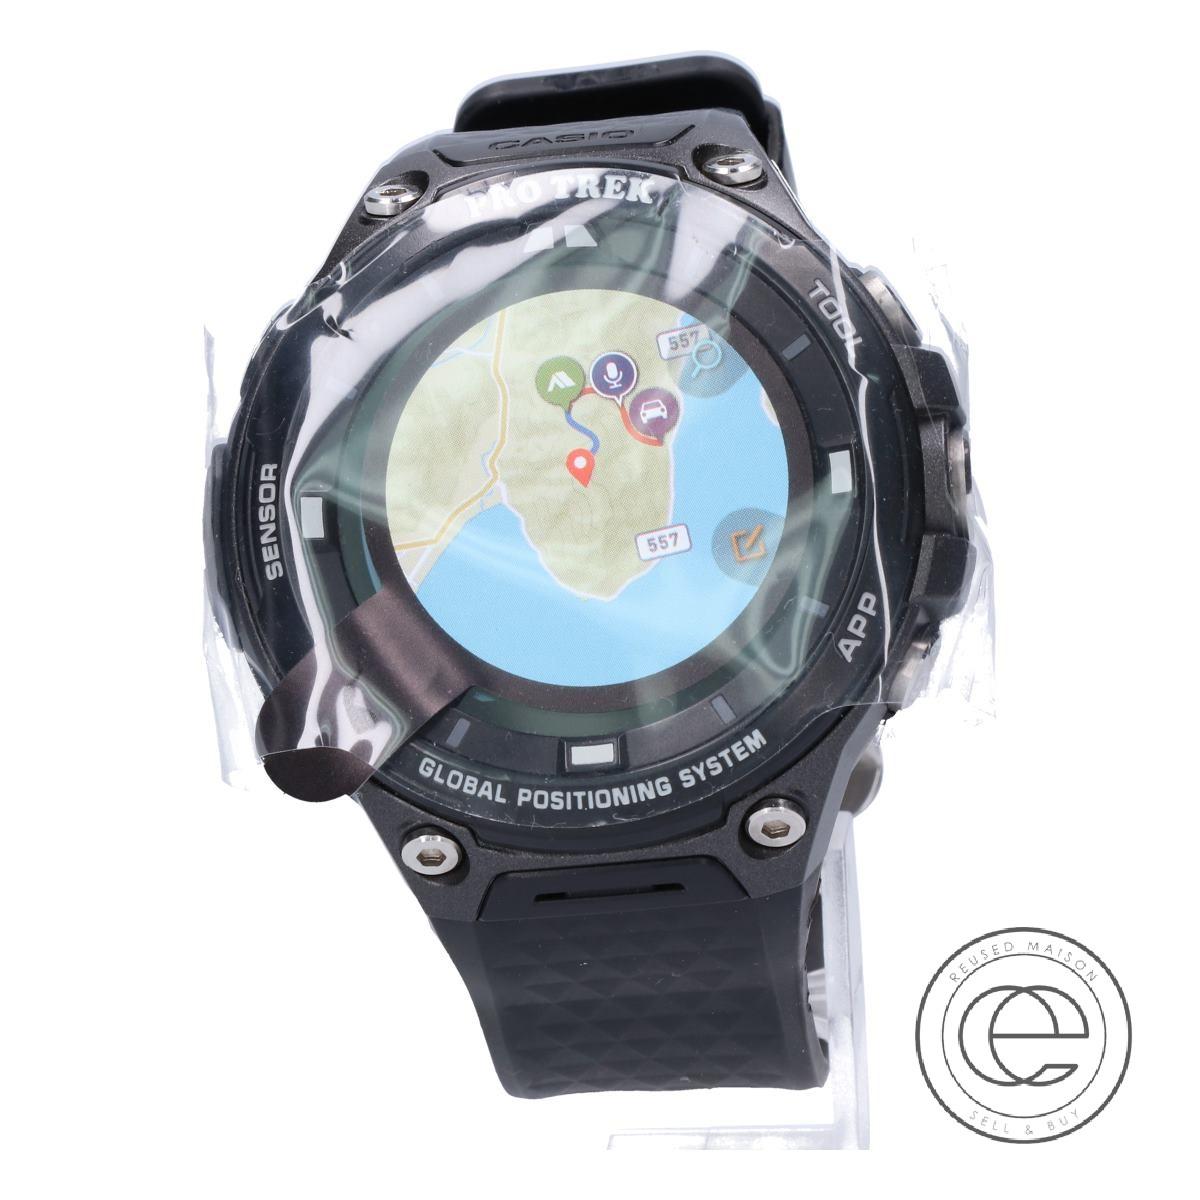 CASIOカシオ 【未使用◇】WSD-F20-BK PRO TREK Smartプロトレックスマート GPS搭載 アウトドアウォッチ 腕時計 ブラック メンズ 【中古】